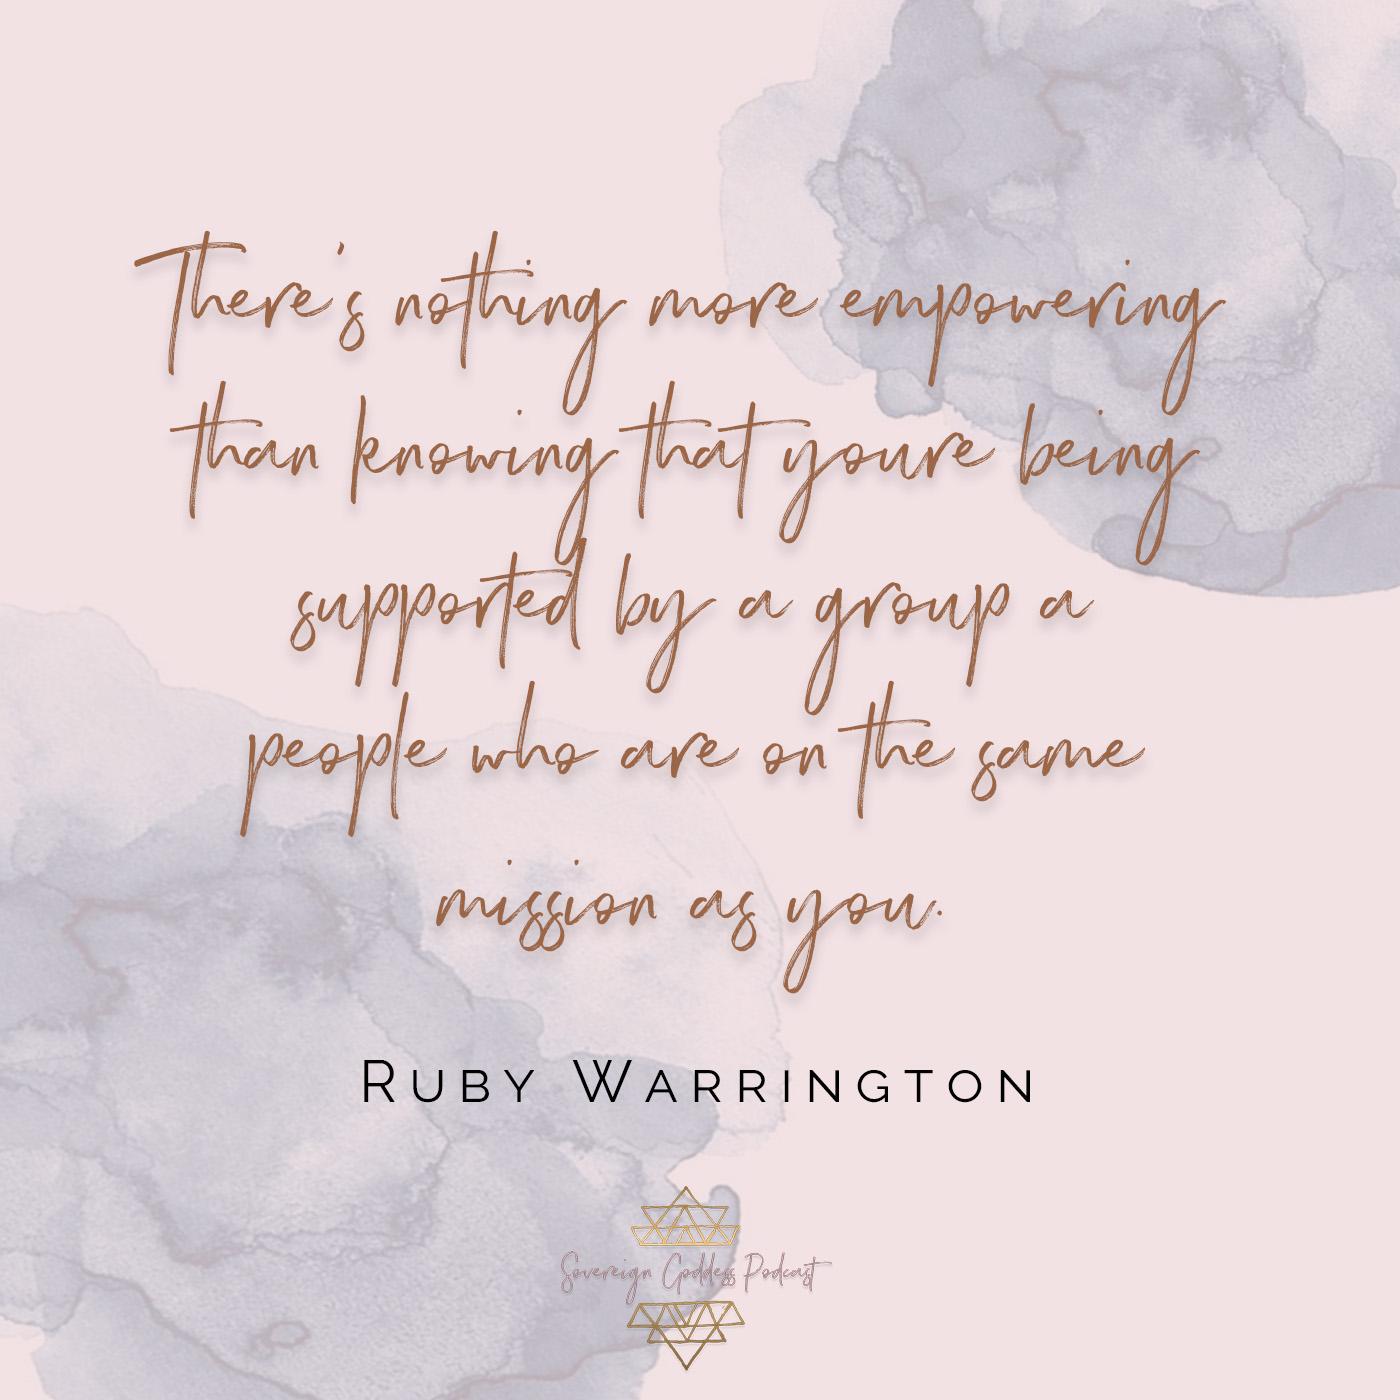 ruby warrington on the Sovereign Goddess Podcast